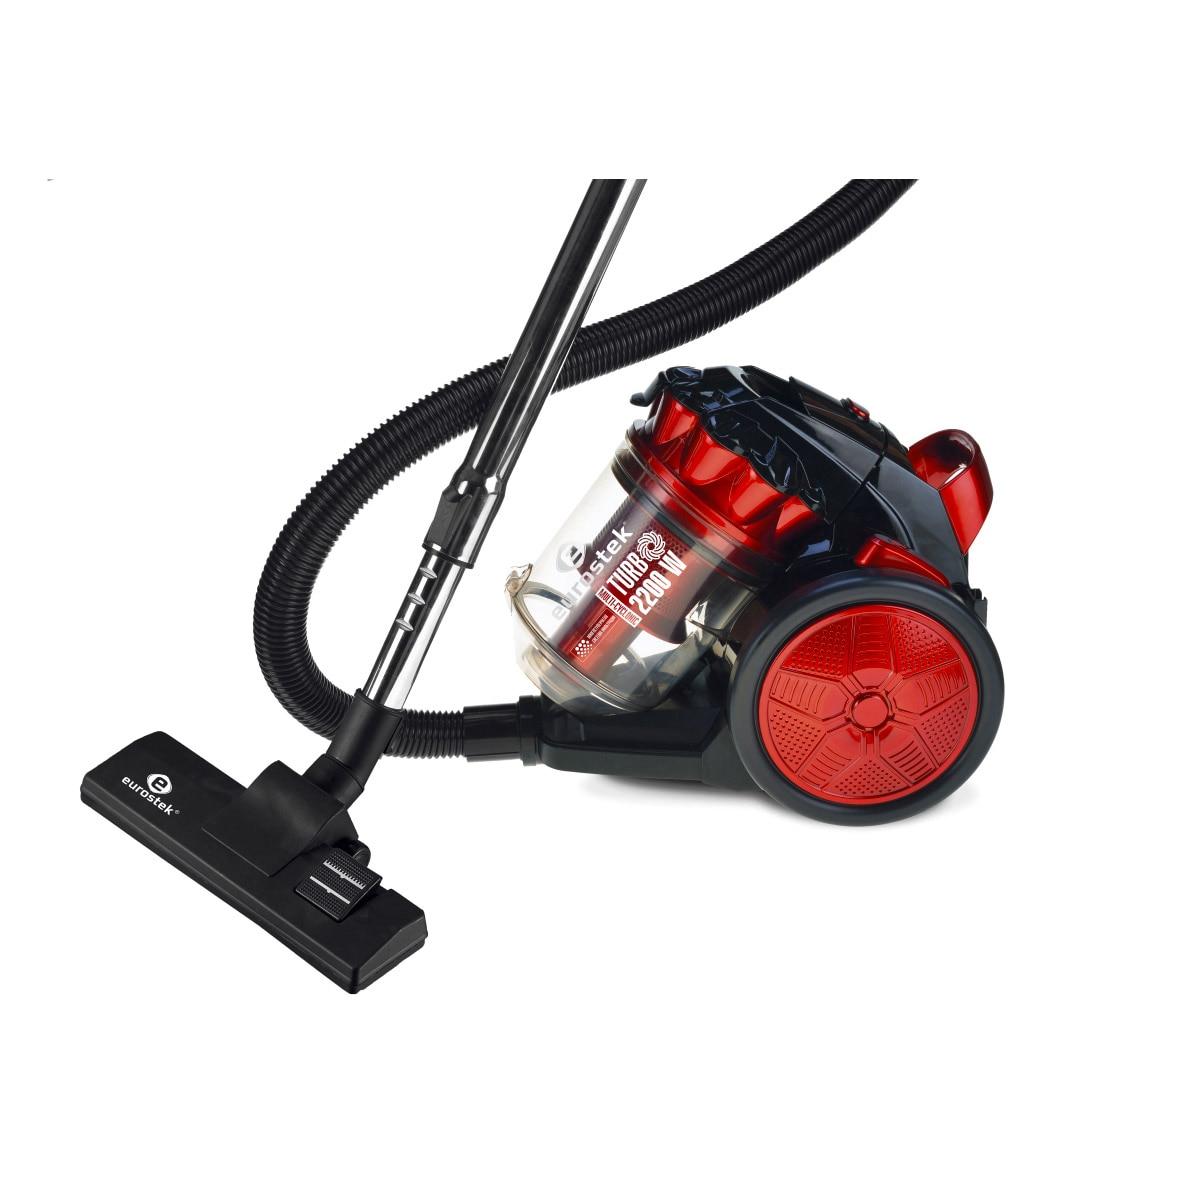 Vacuum cleaner electric Eurostek EVC-3002